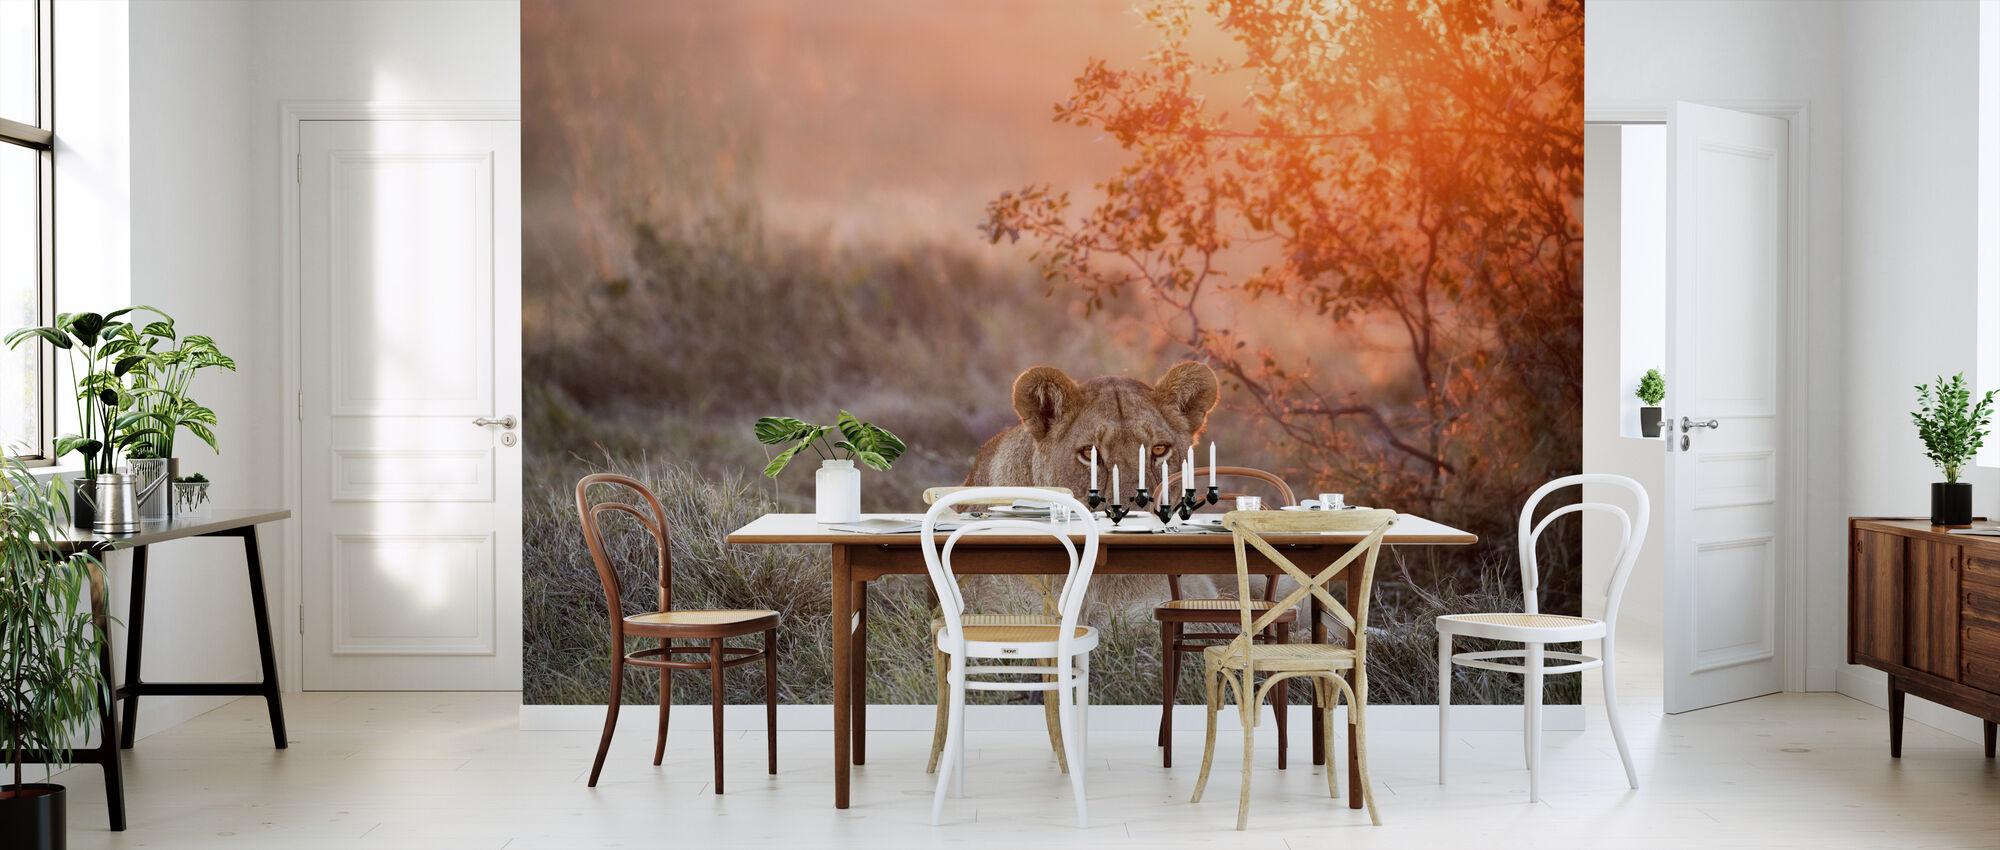 Sunset Lioness - Wallpaper - Kitchen